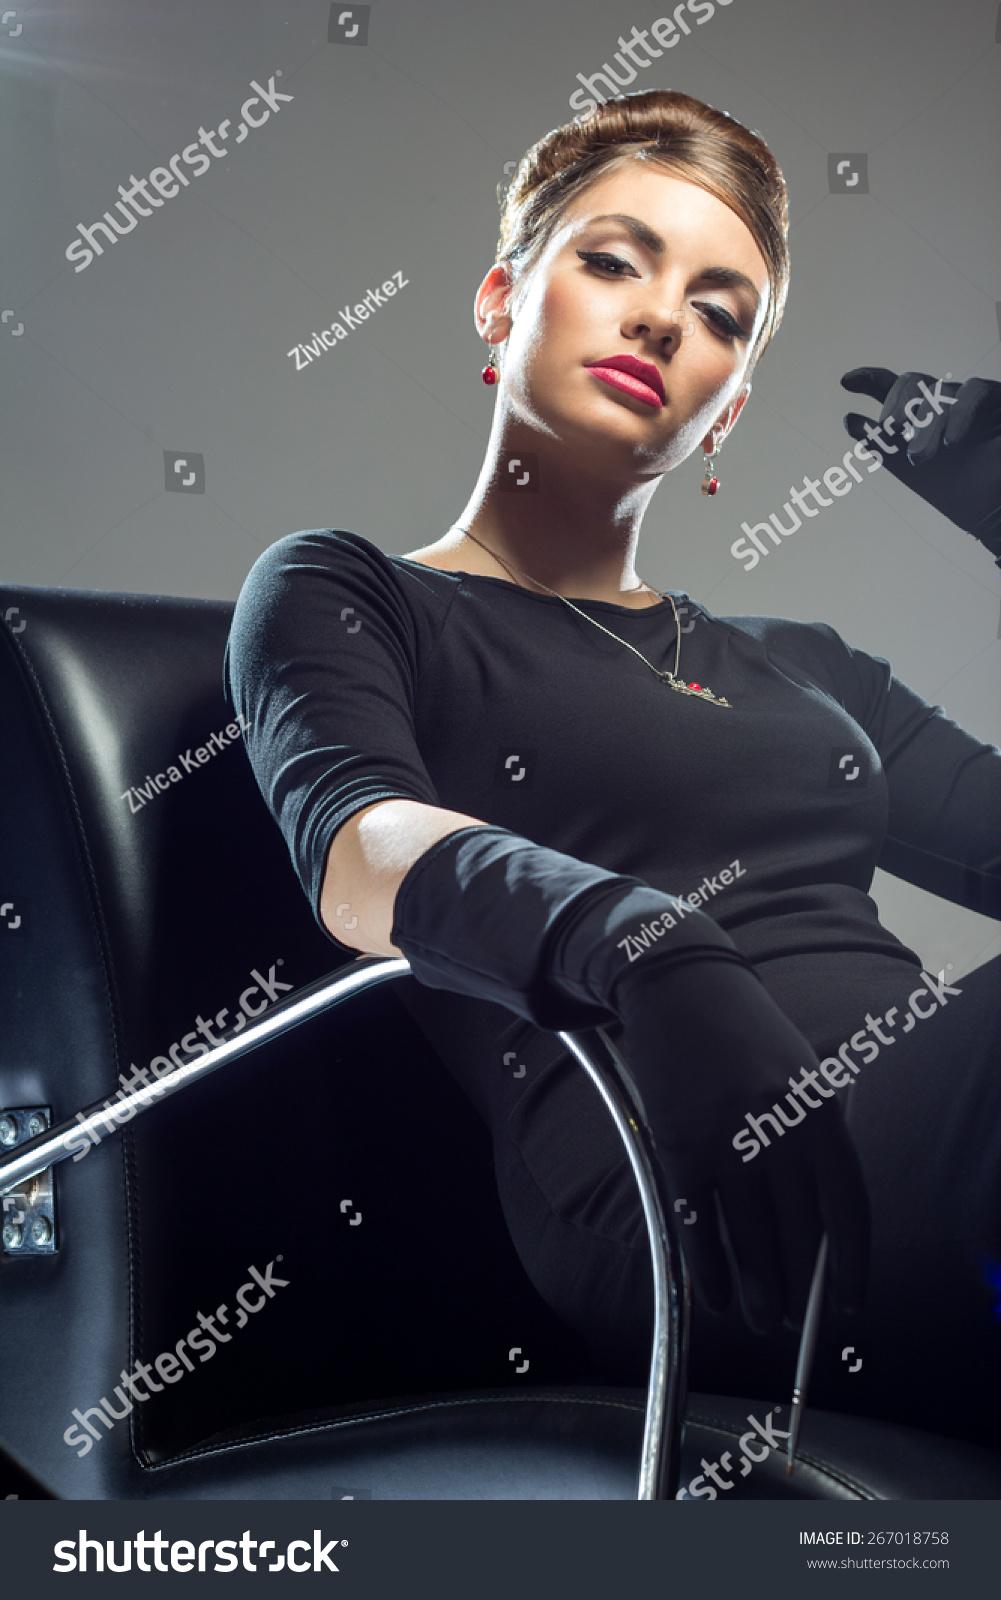 Black dress gloves - Long Dress Gloves Black Beauty